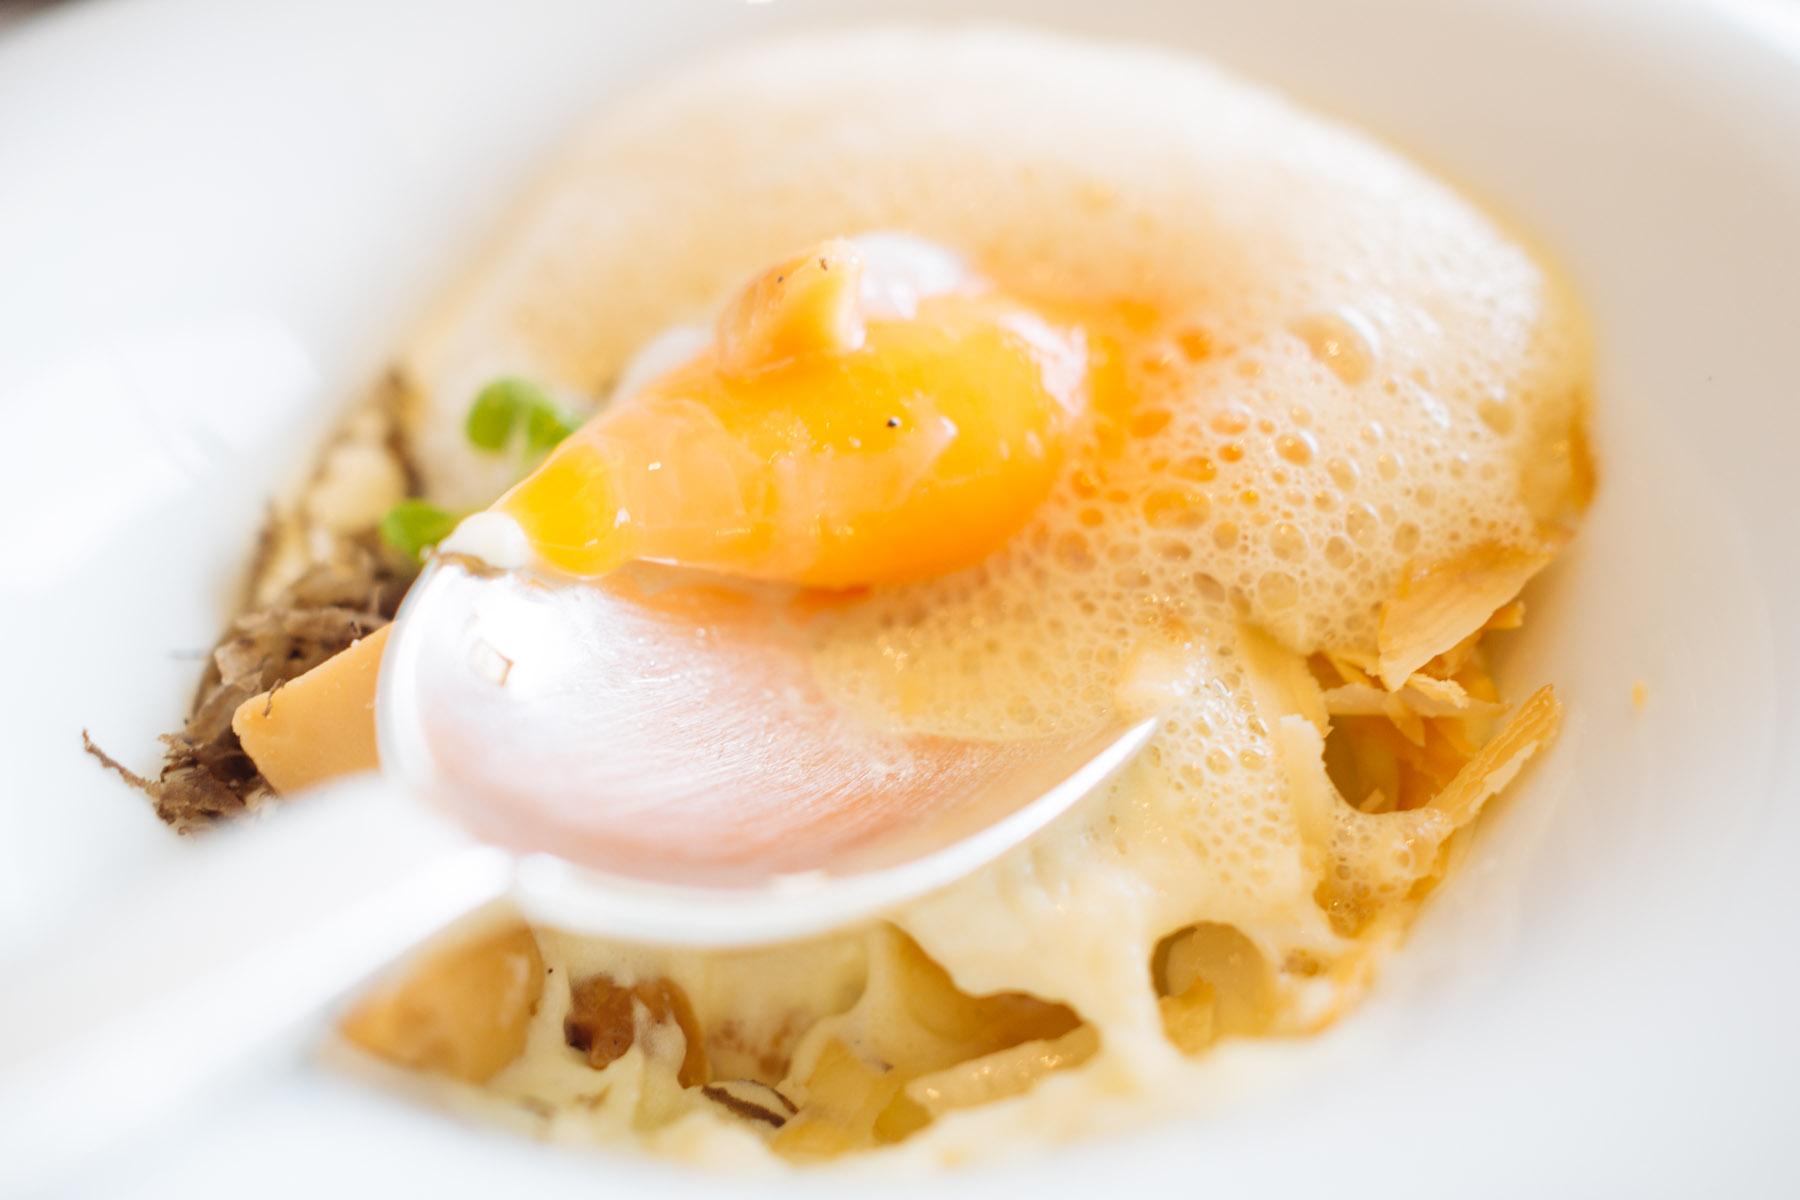 19-jaan-dining-best-restaurant-singapore-swissotel-18